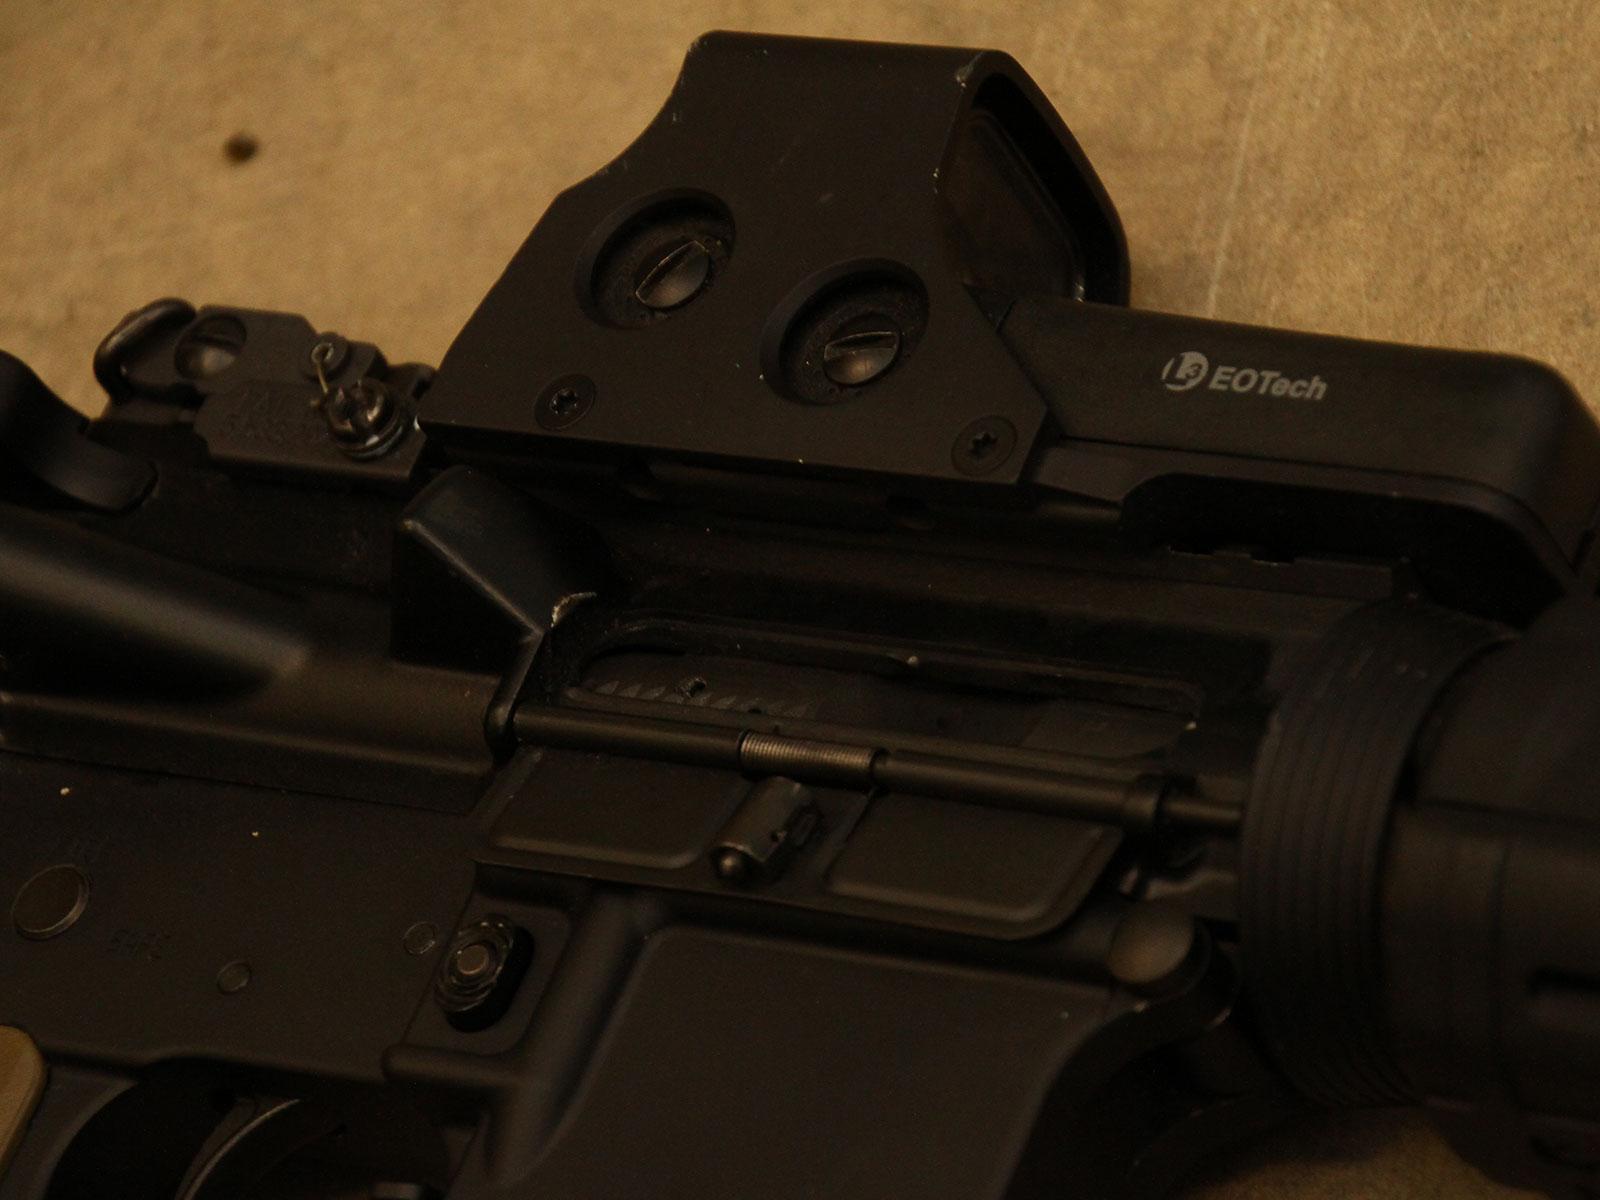 SH_Web_Wir_Waffen_Sabre-Defence3_1600x1200